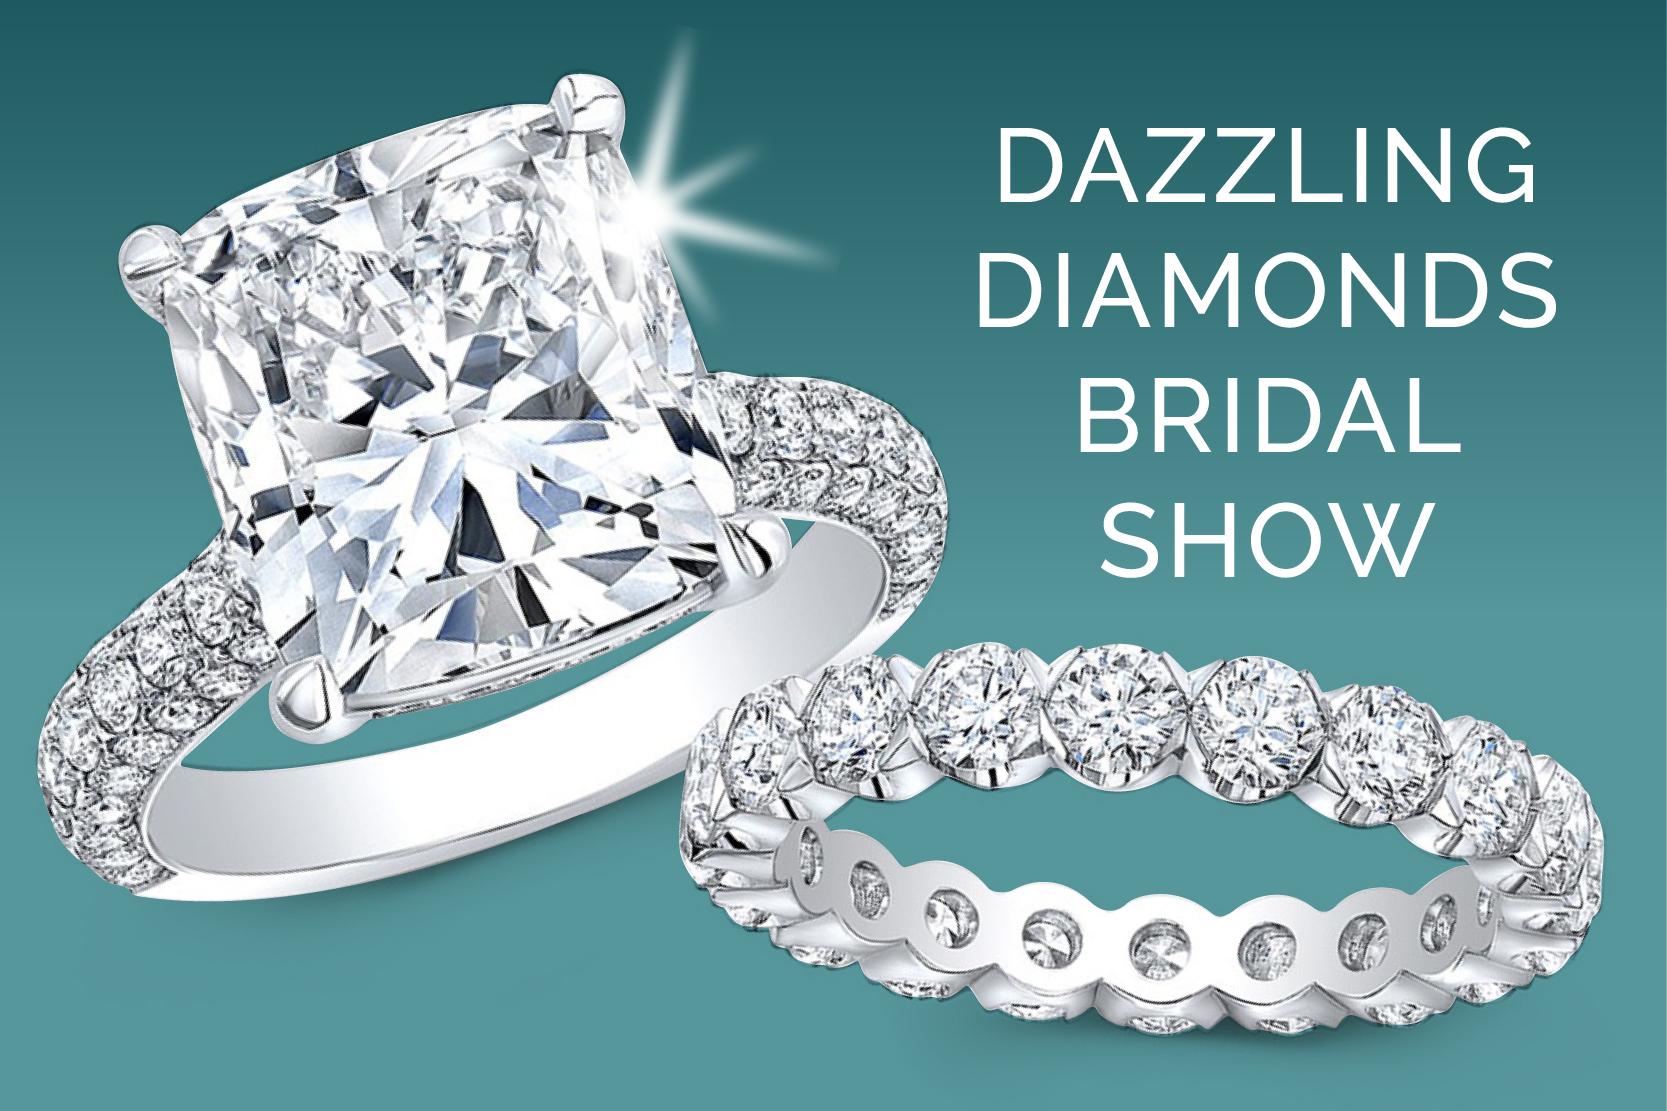 Dazzling Diamonds Bridal Show